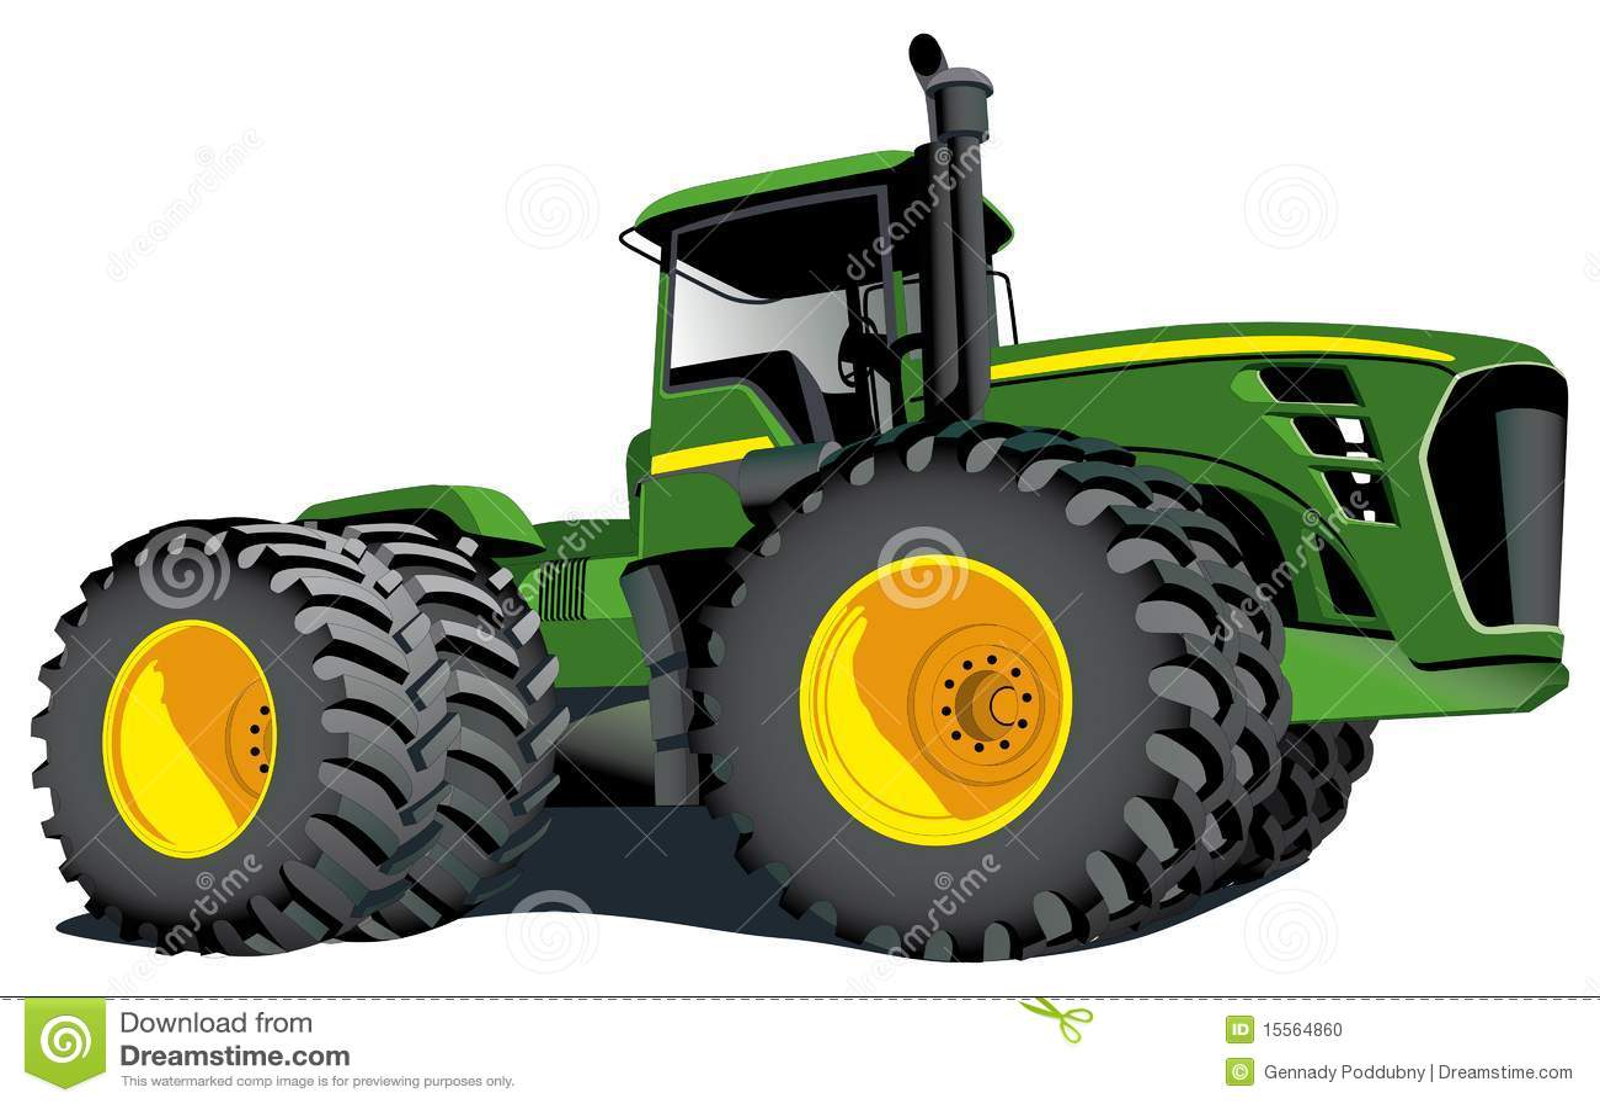 Muddy Tractor Clip Art : John deere